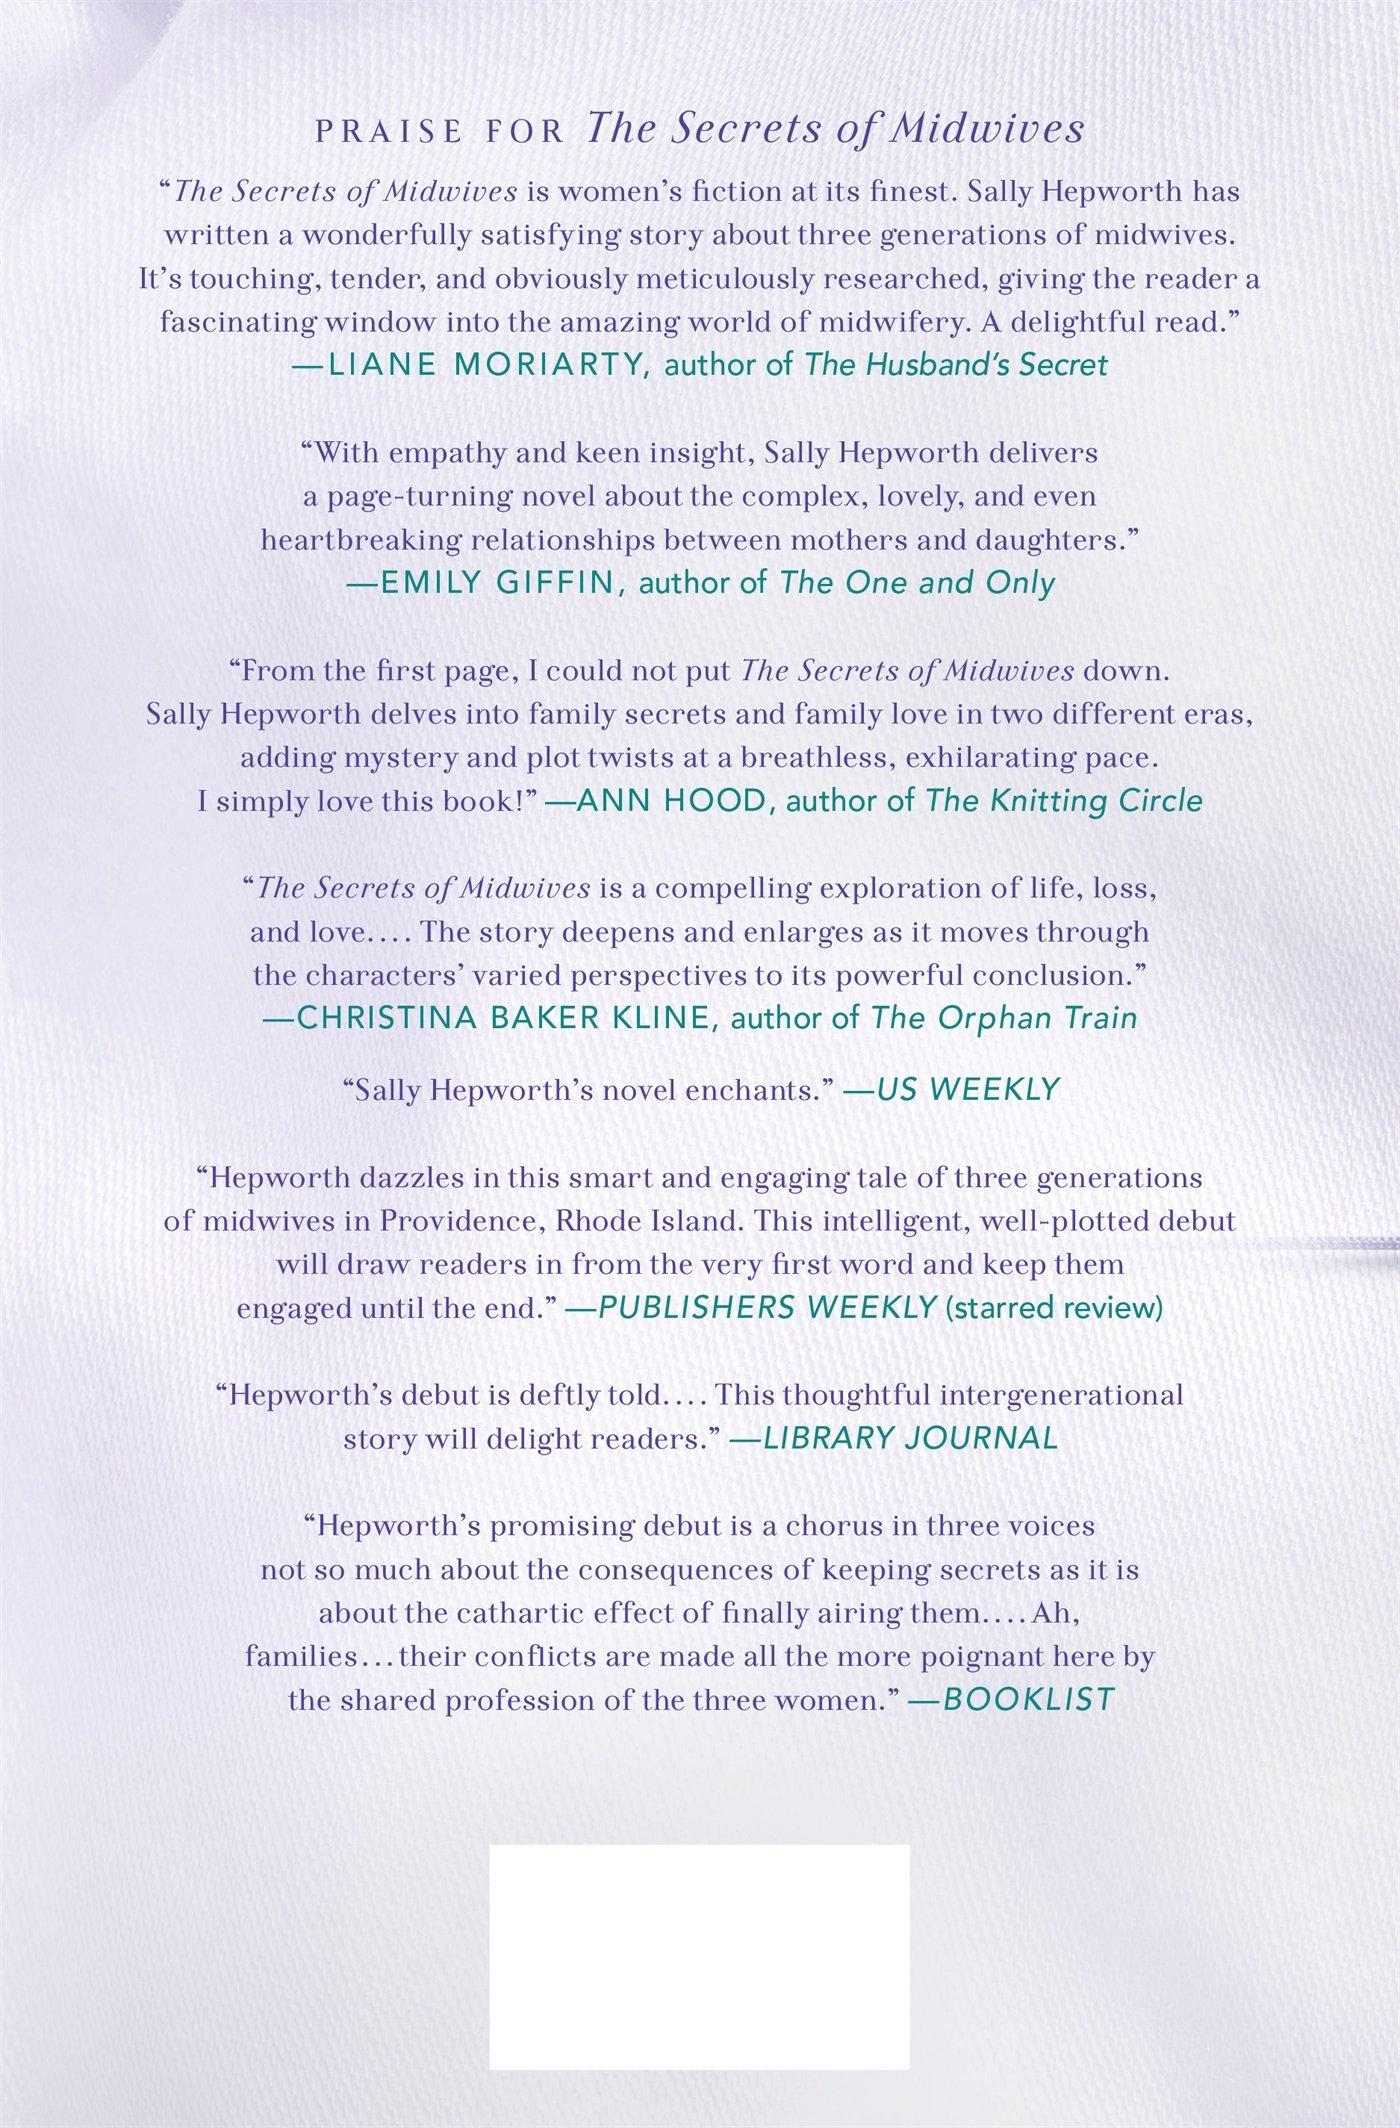 The Things We Keep: A Novel: Sally Hepworth: 9781250051905: Amazon:  Books